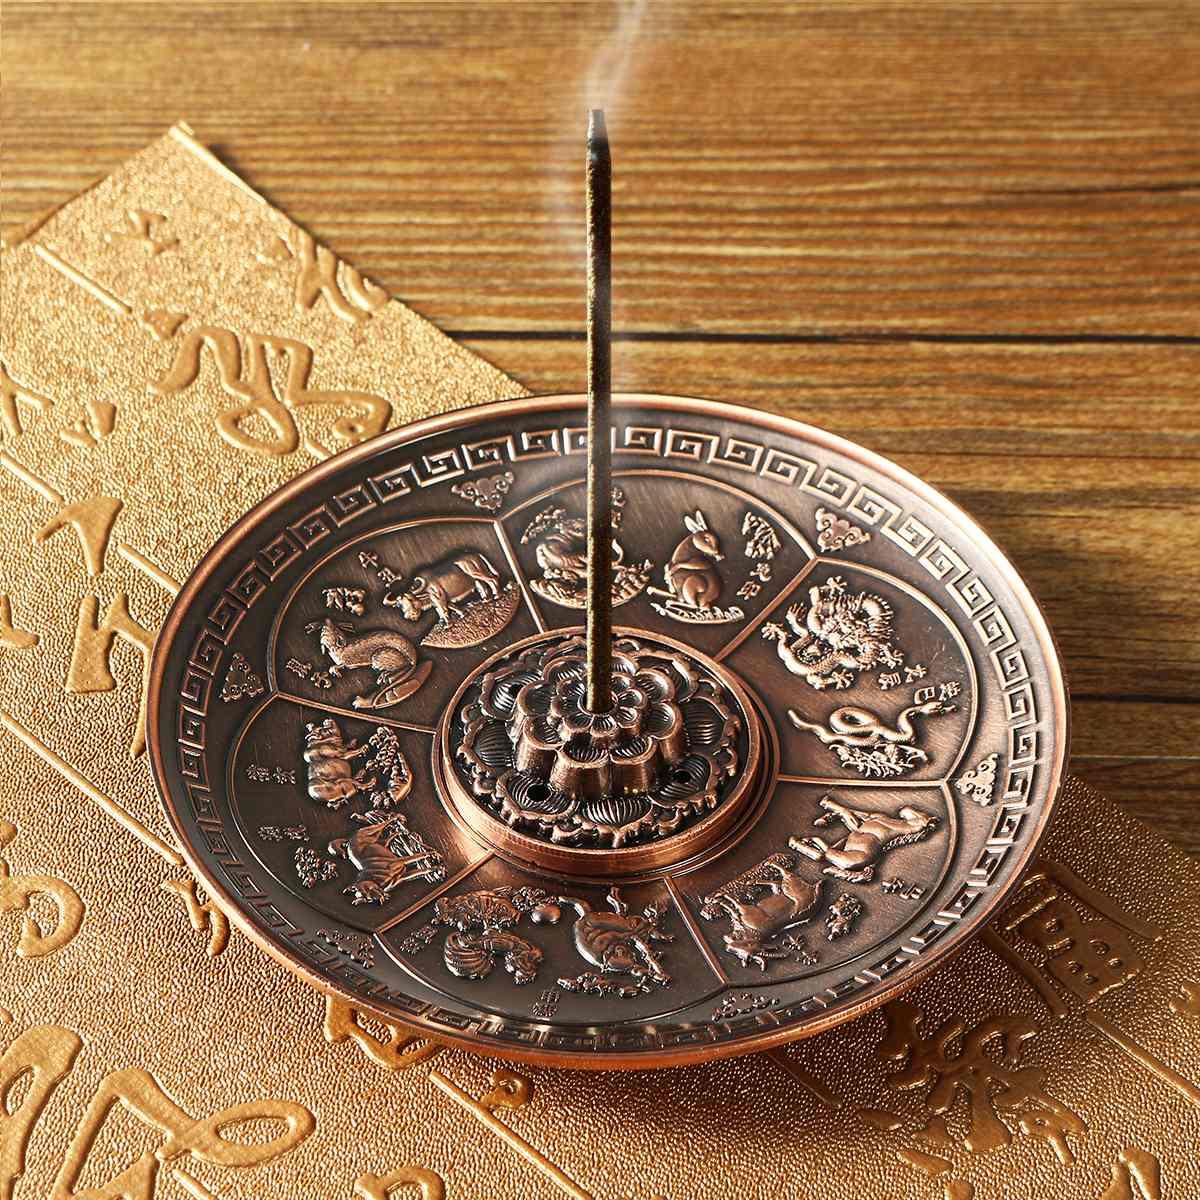 3 x Retro Incense Burner Cone Holder Gourd Copper Incense Burner Incense Furnace